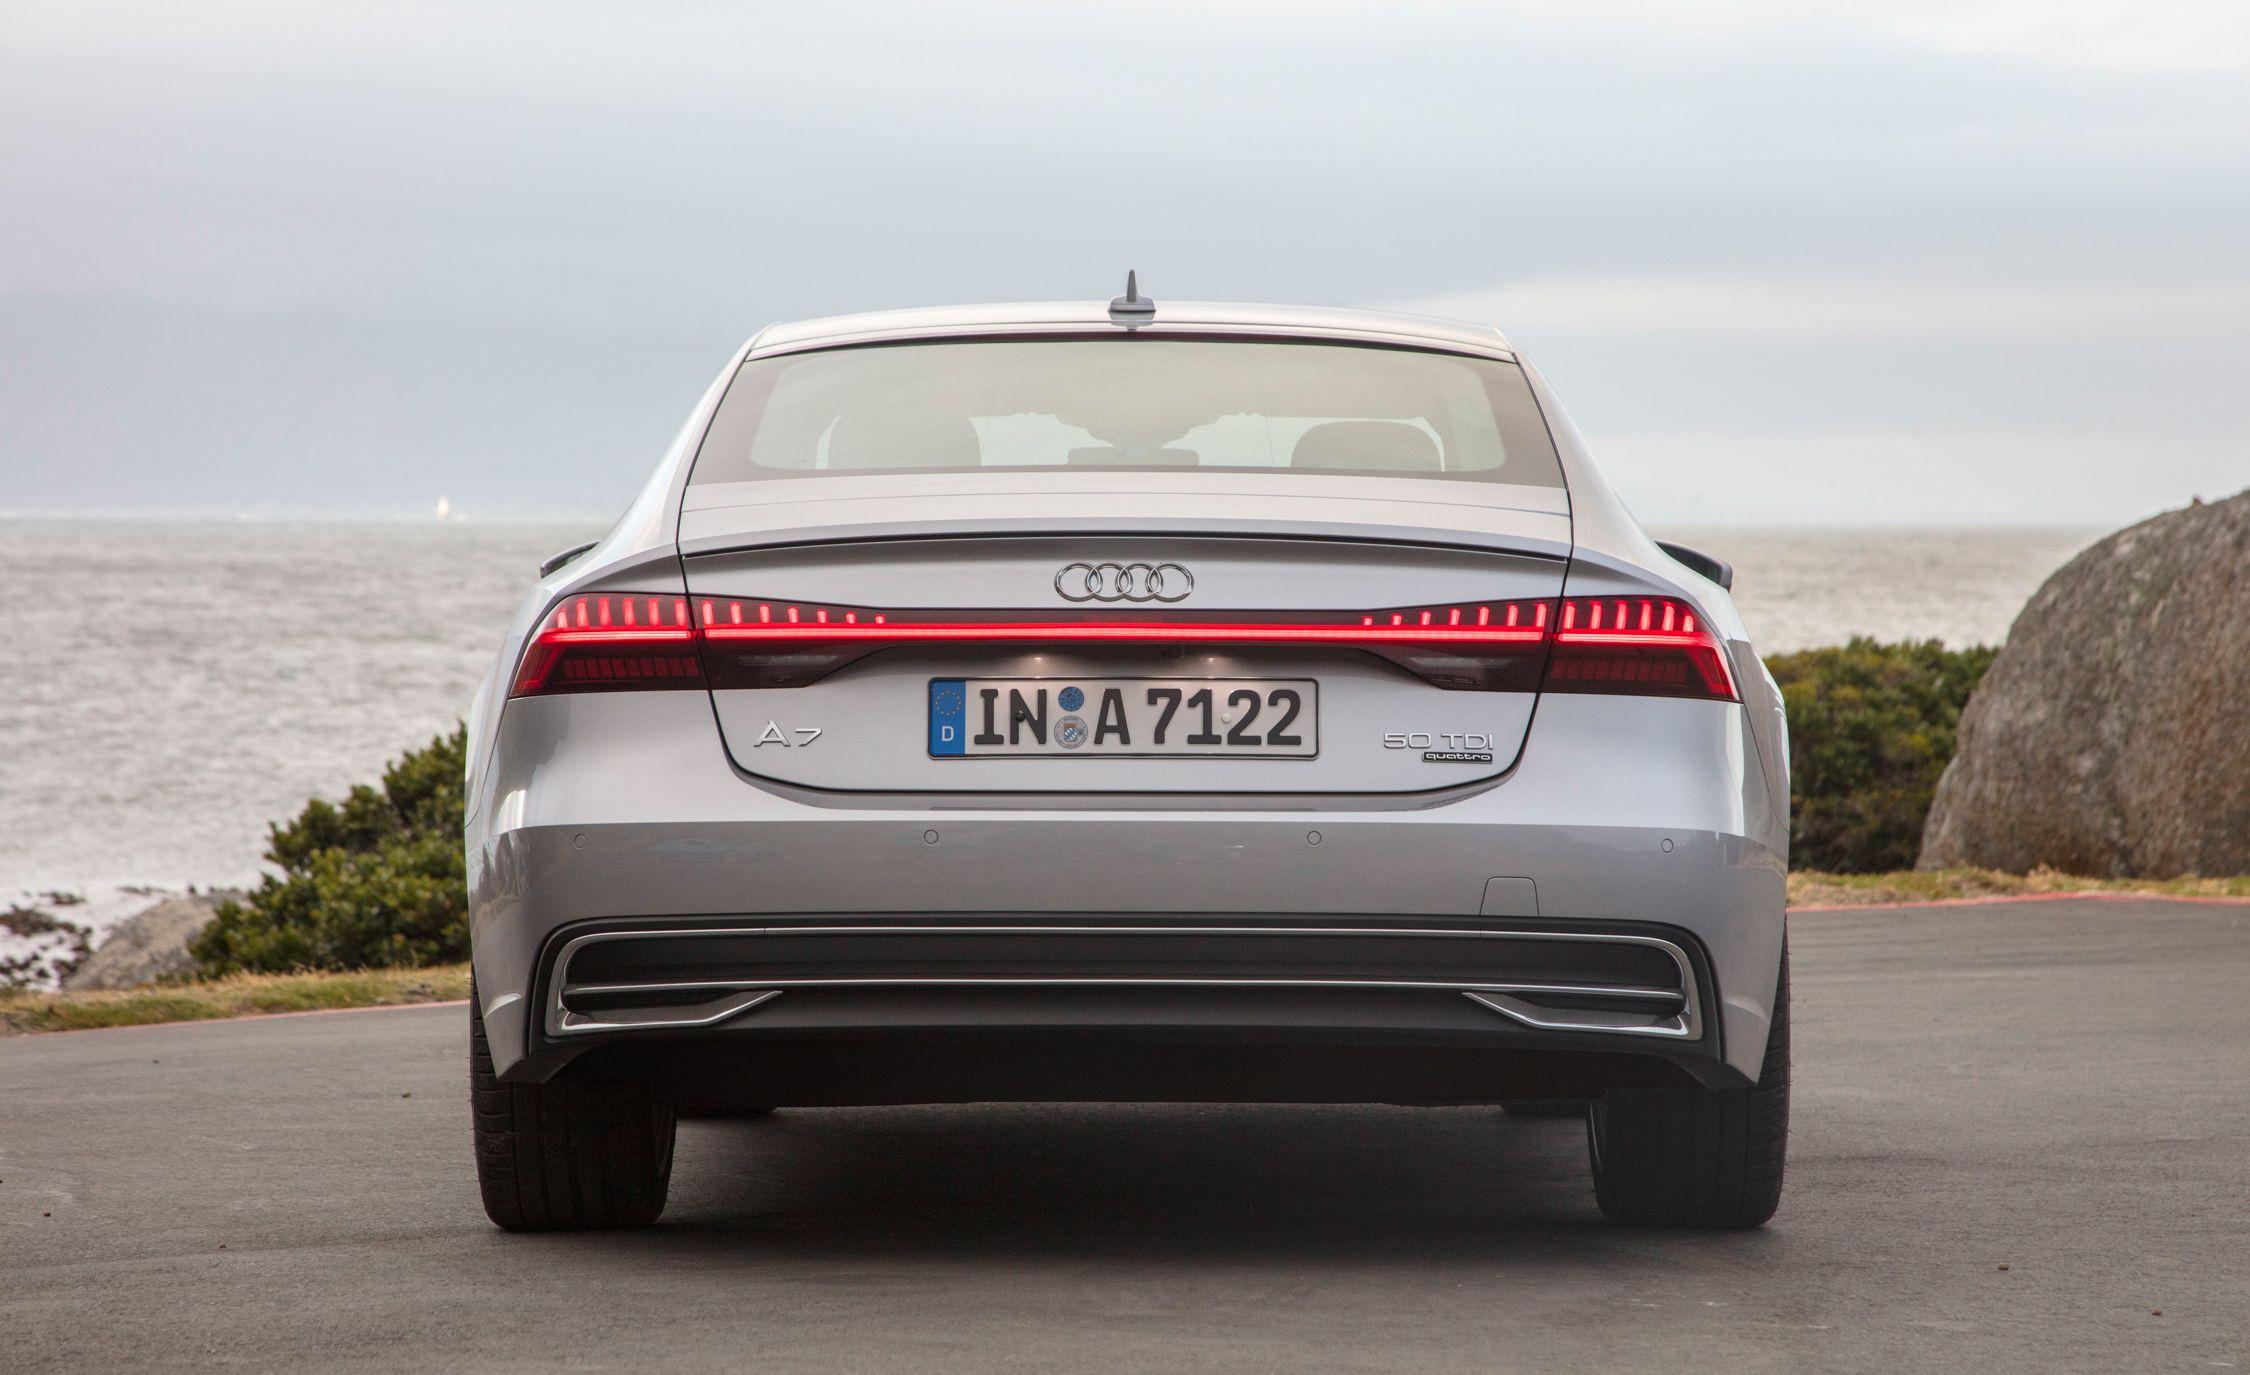 2019-Audi-A7-Sportback-147-1.jpg